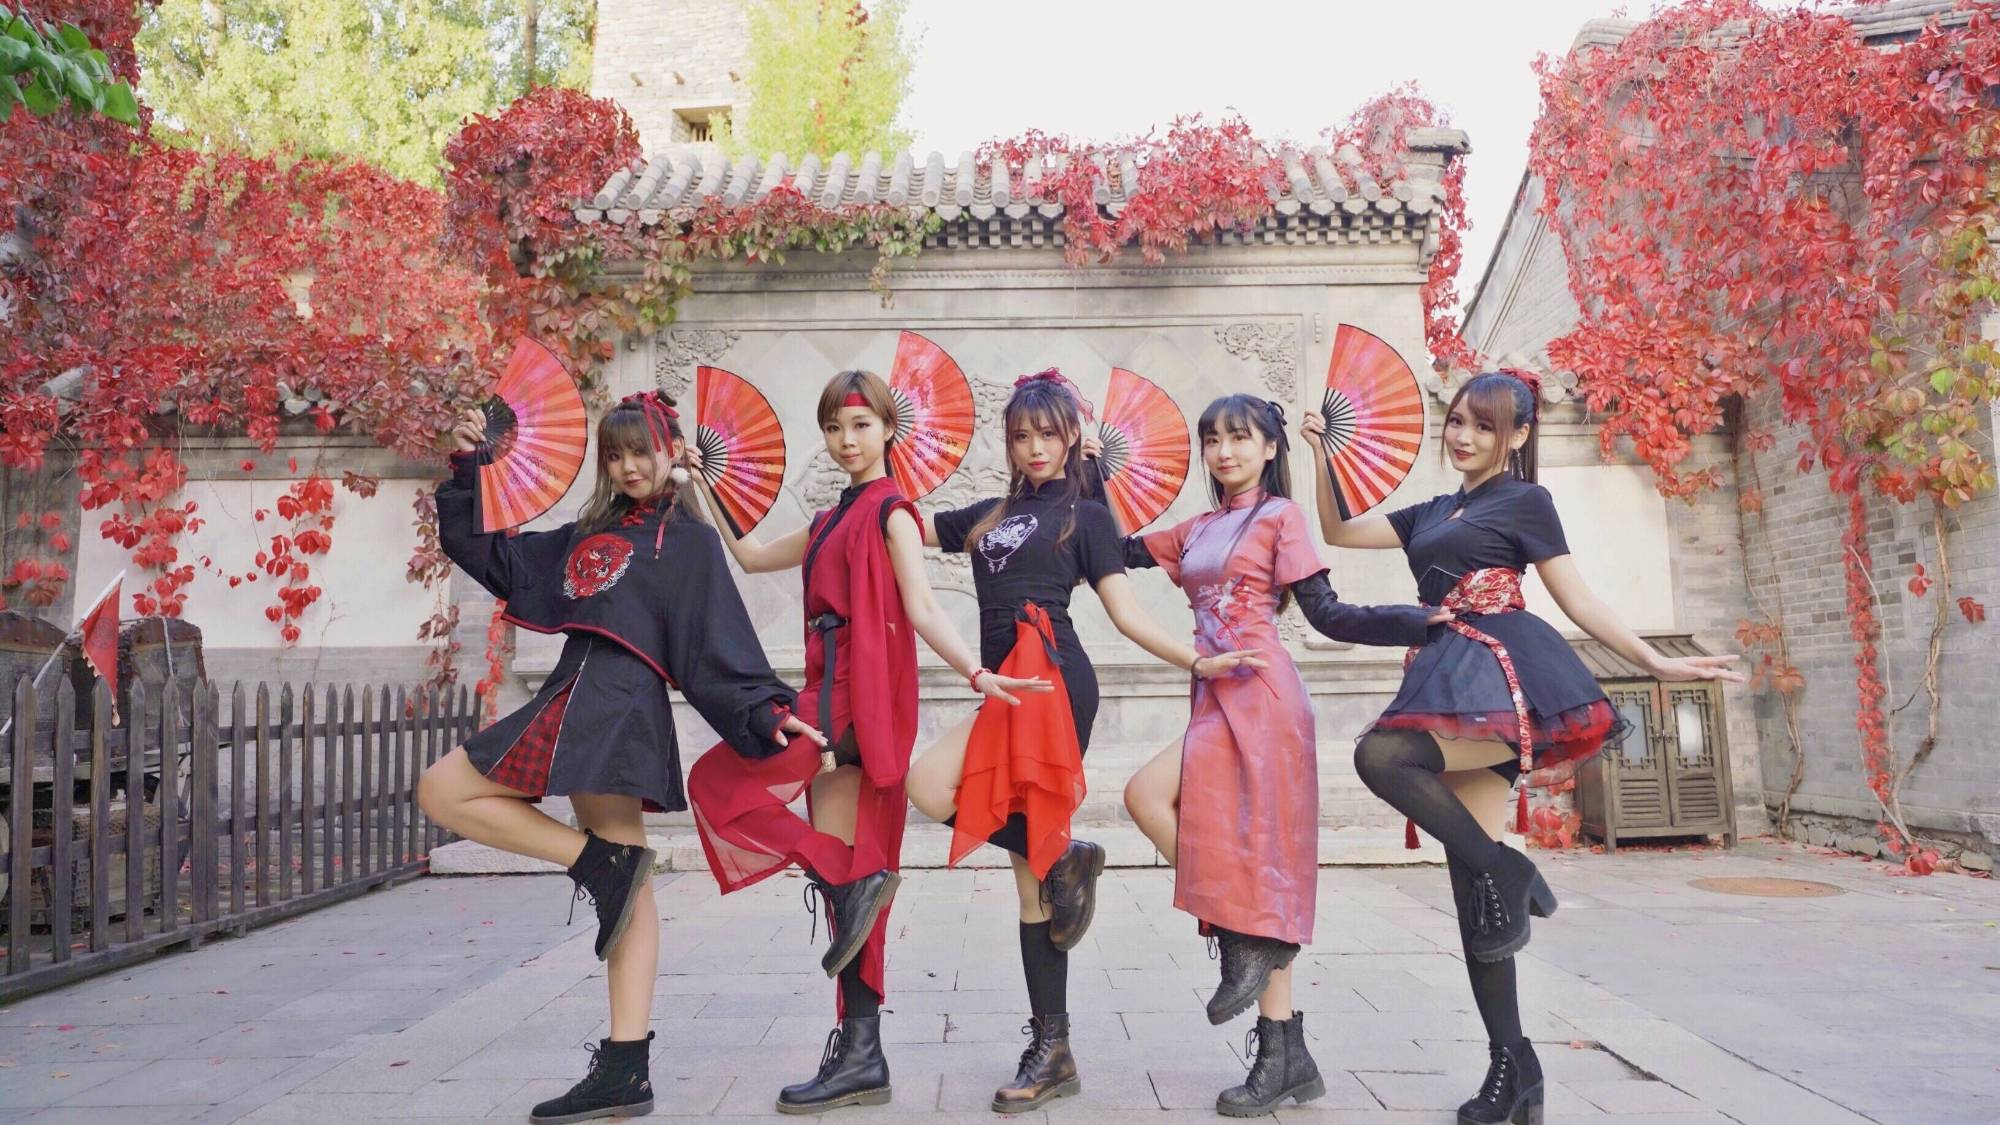 【LoveMuses】【夏日蕉易战】同步爆表◆千盏◆国风扇舞【星舞银河2020团体组】